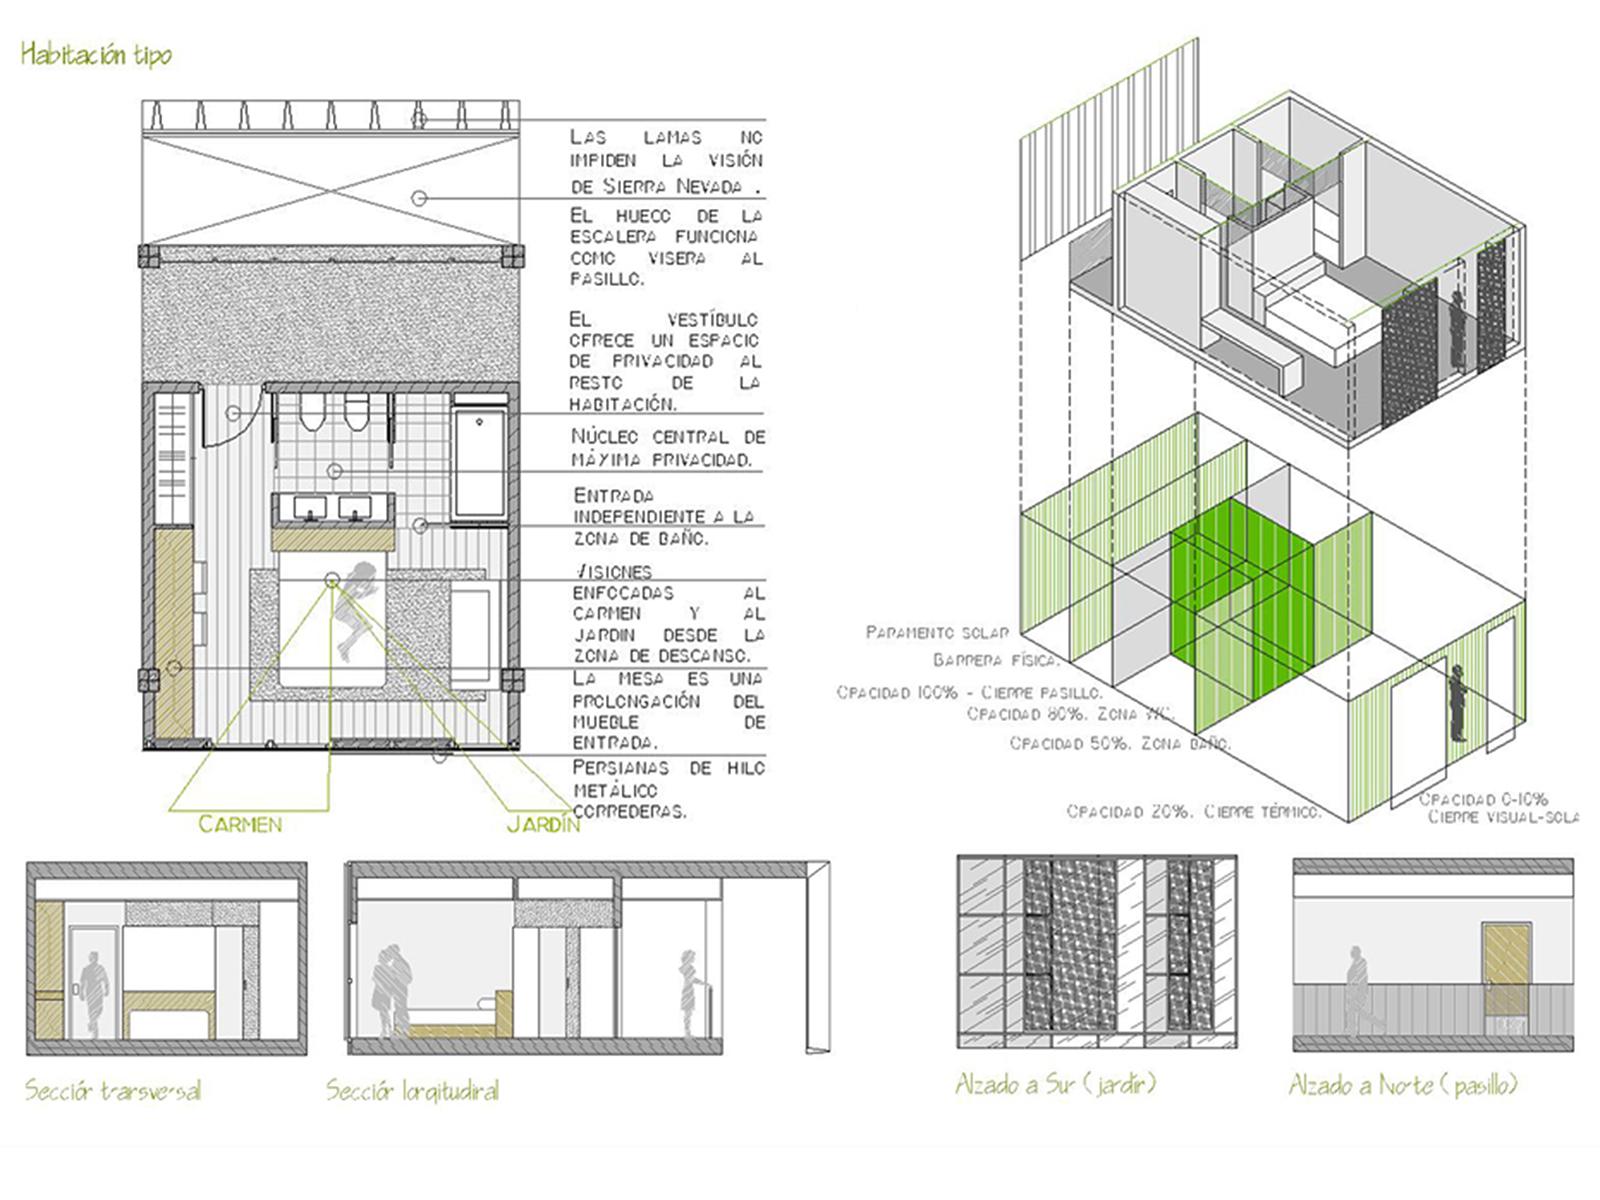 habitaciones_1600x1200